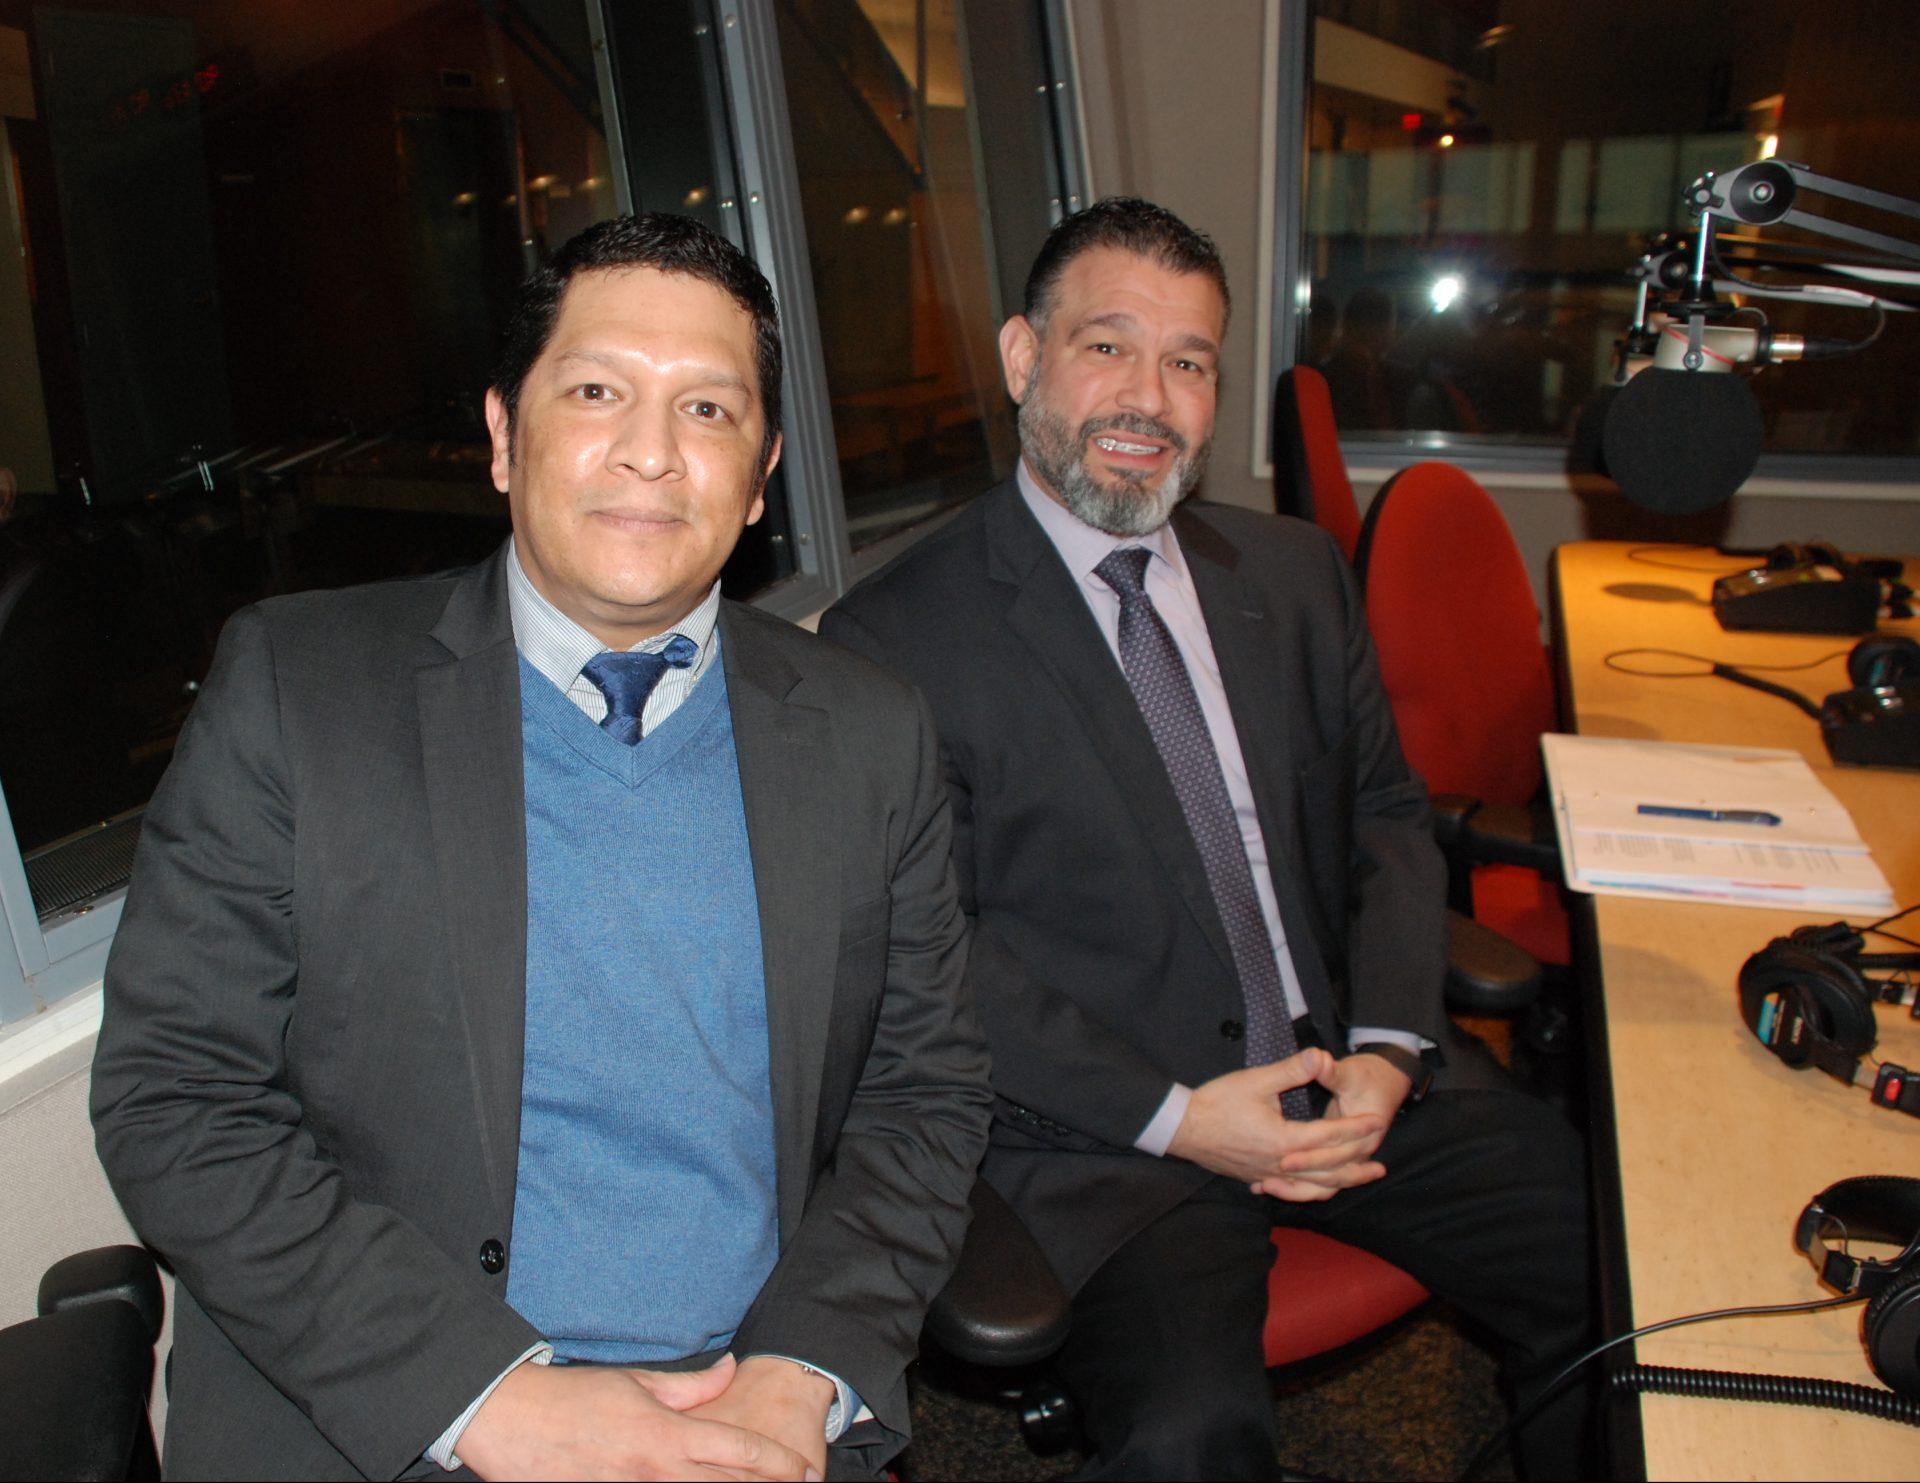 Dep. Sec. Noe Ortega and Pennsylvania Secretary of Education Pedro Rivera appear on Smart Talk on February 25, 2020.